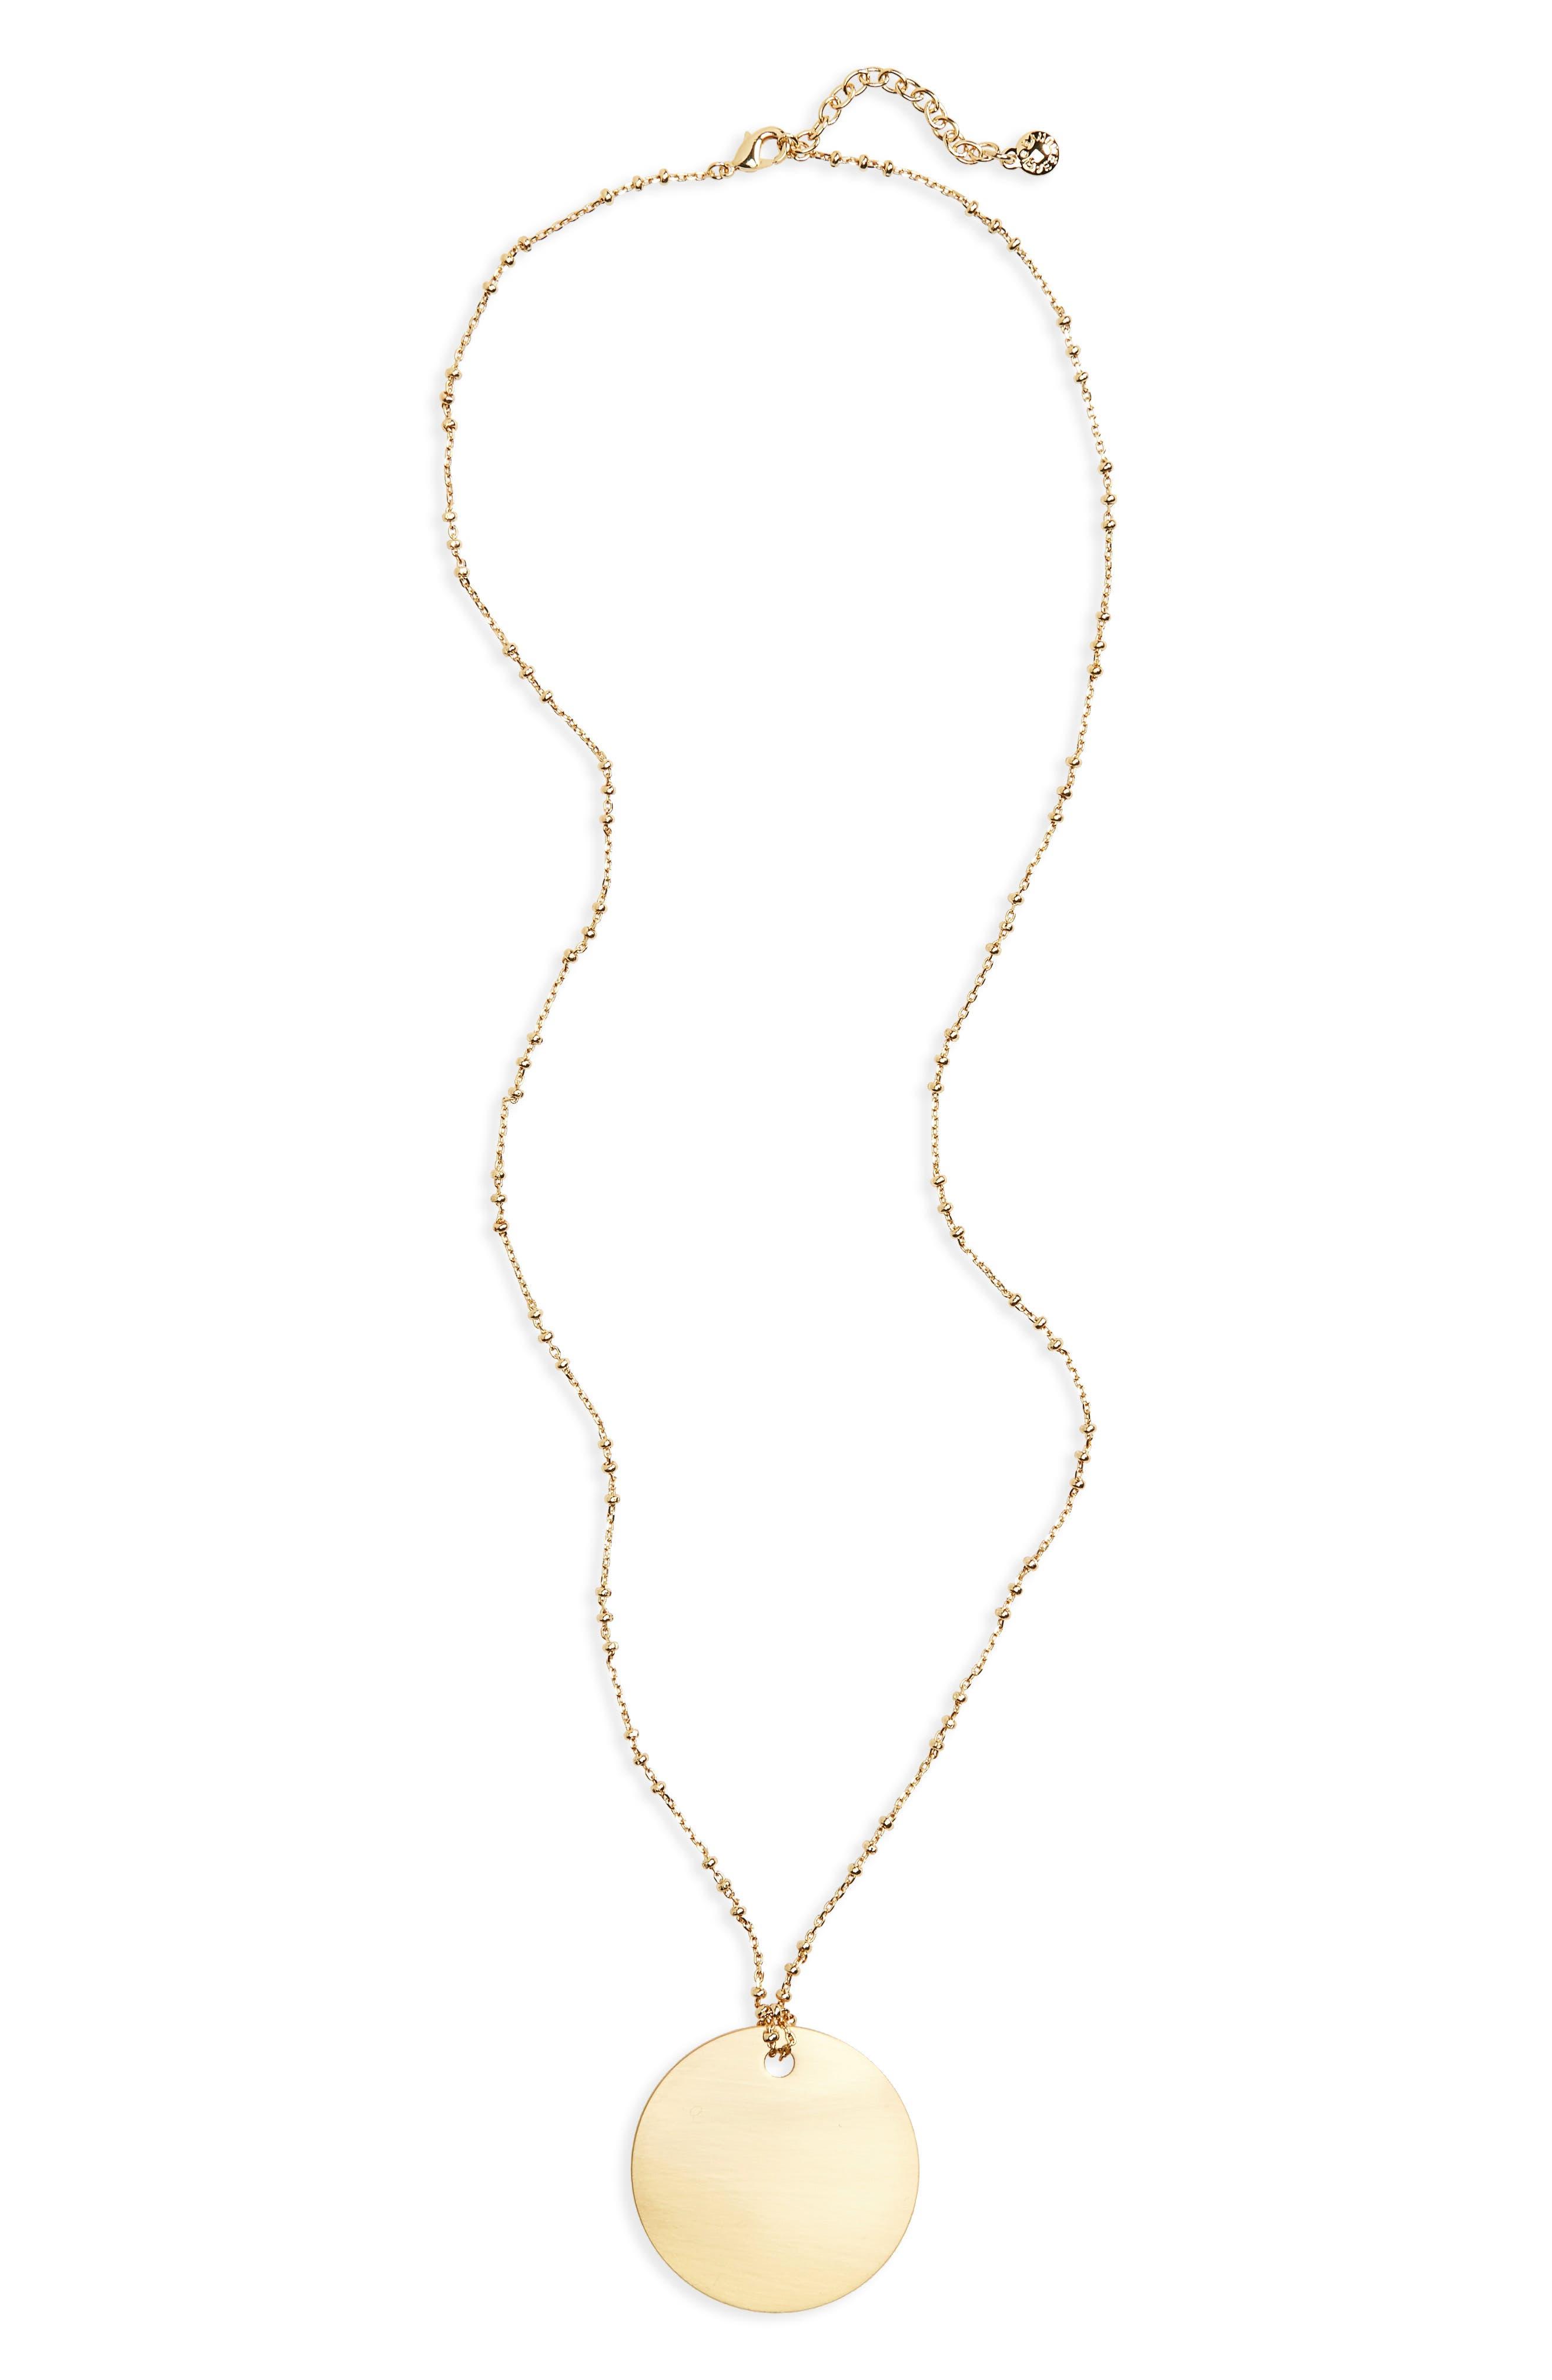 Main Image - BaubleBar Ada Pendant Necklace